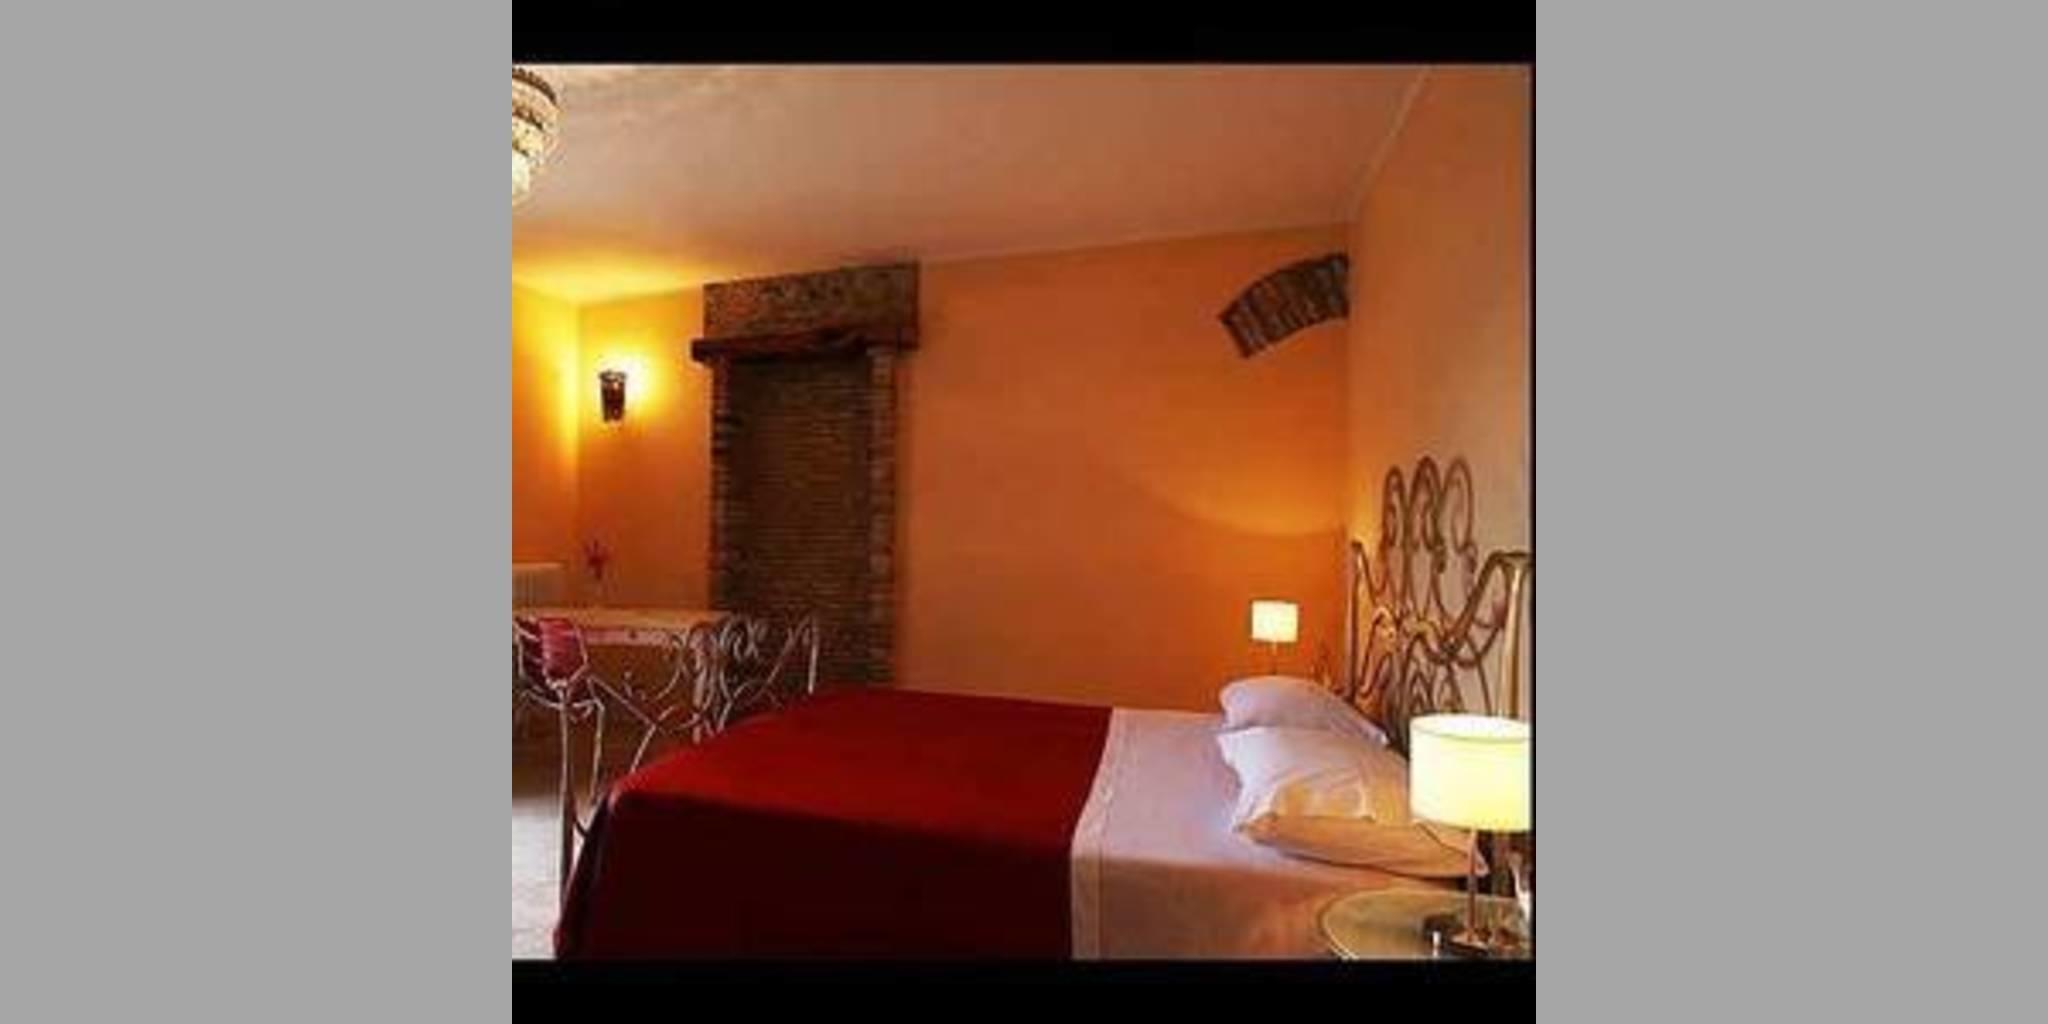 Bed & Breakfast Civita - Civita